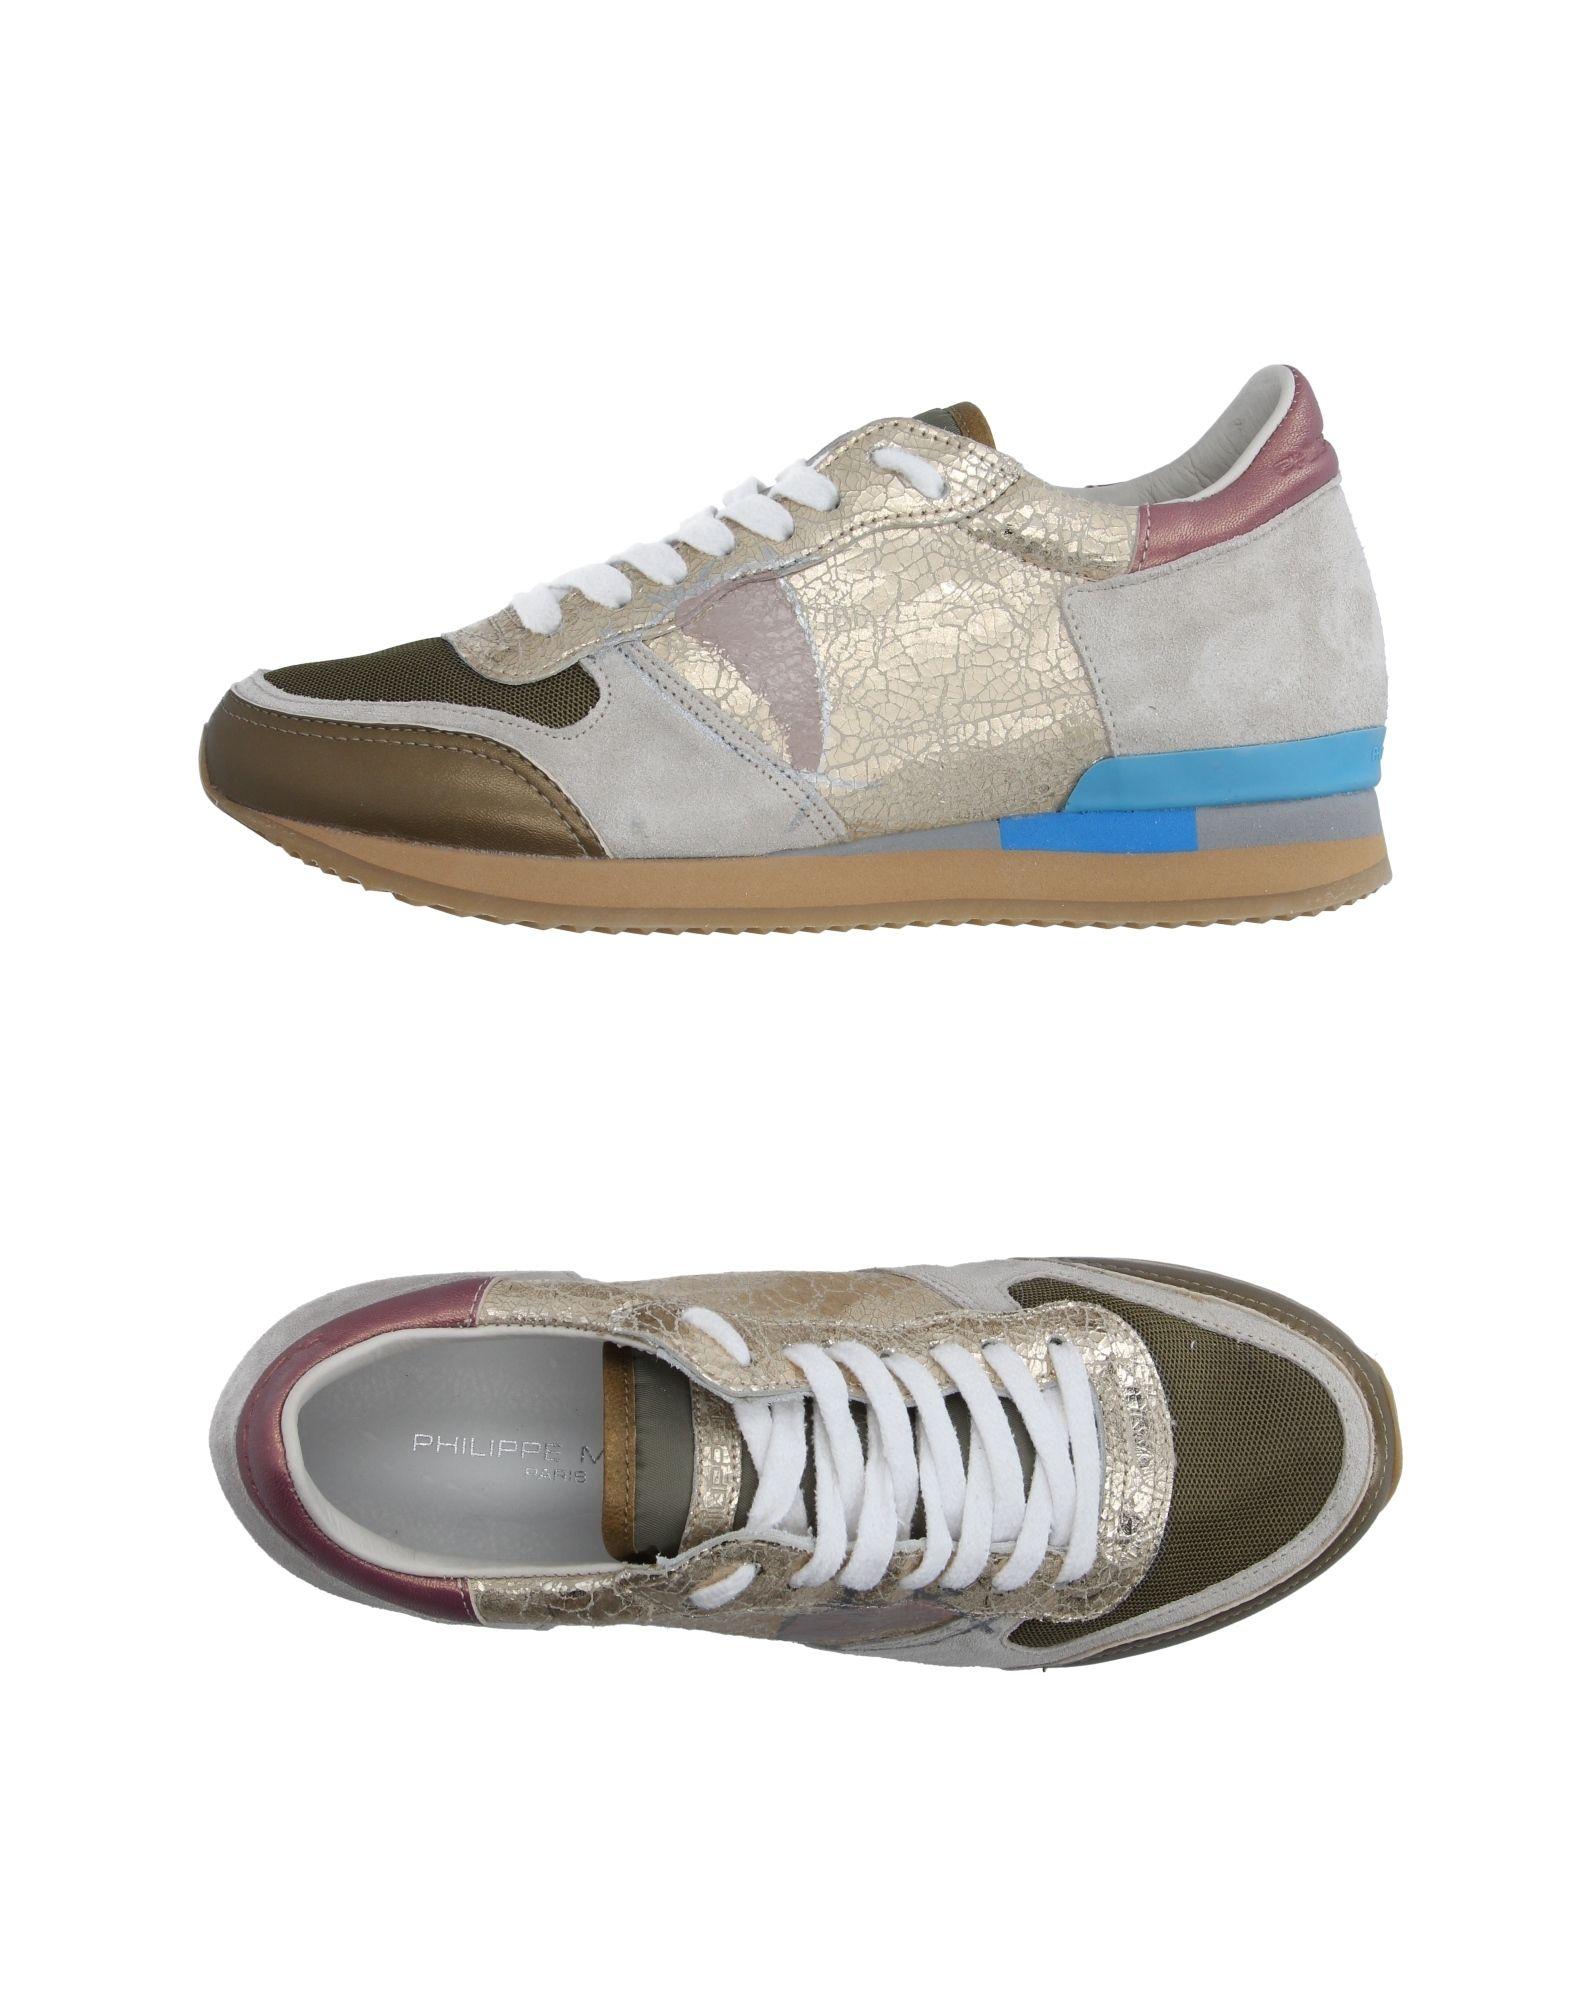 Philippe Model Sneakers Damen  11127930XEGut aussehende strapazierfähige Schuhe